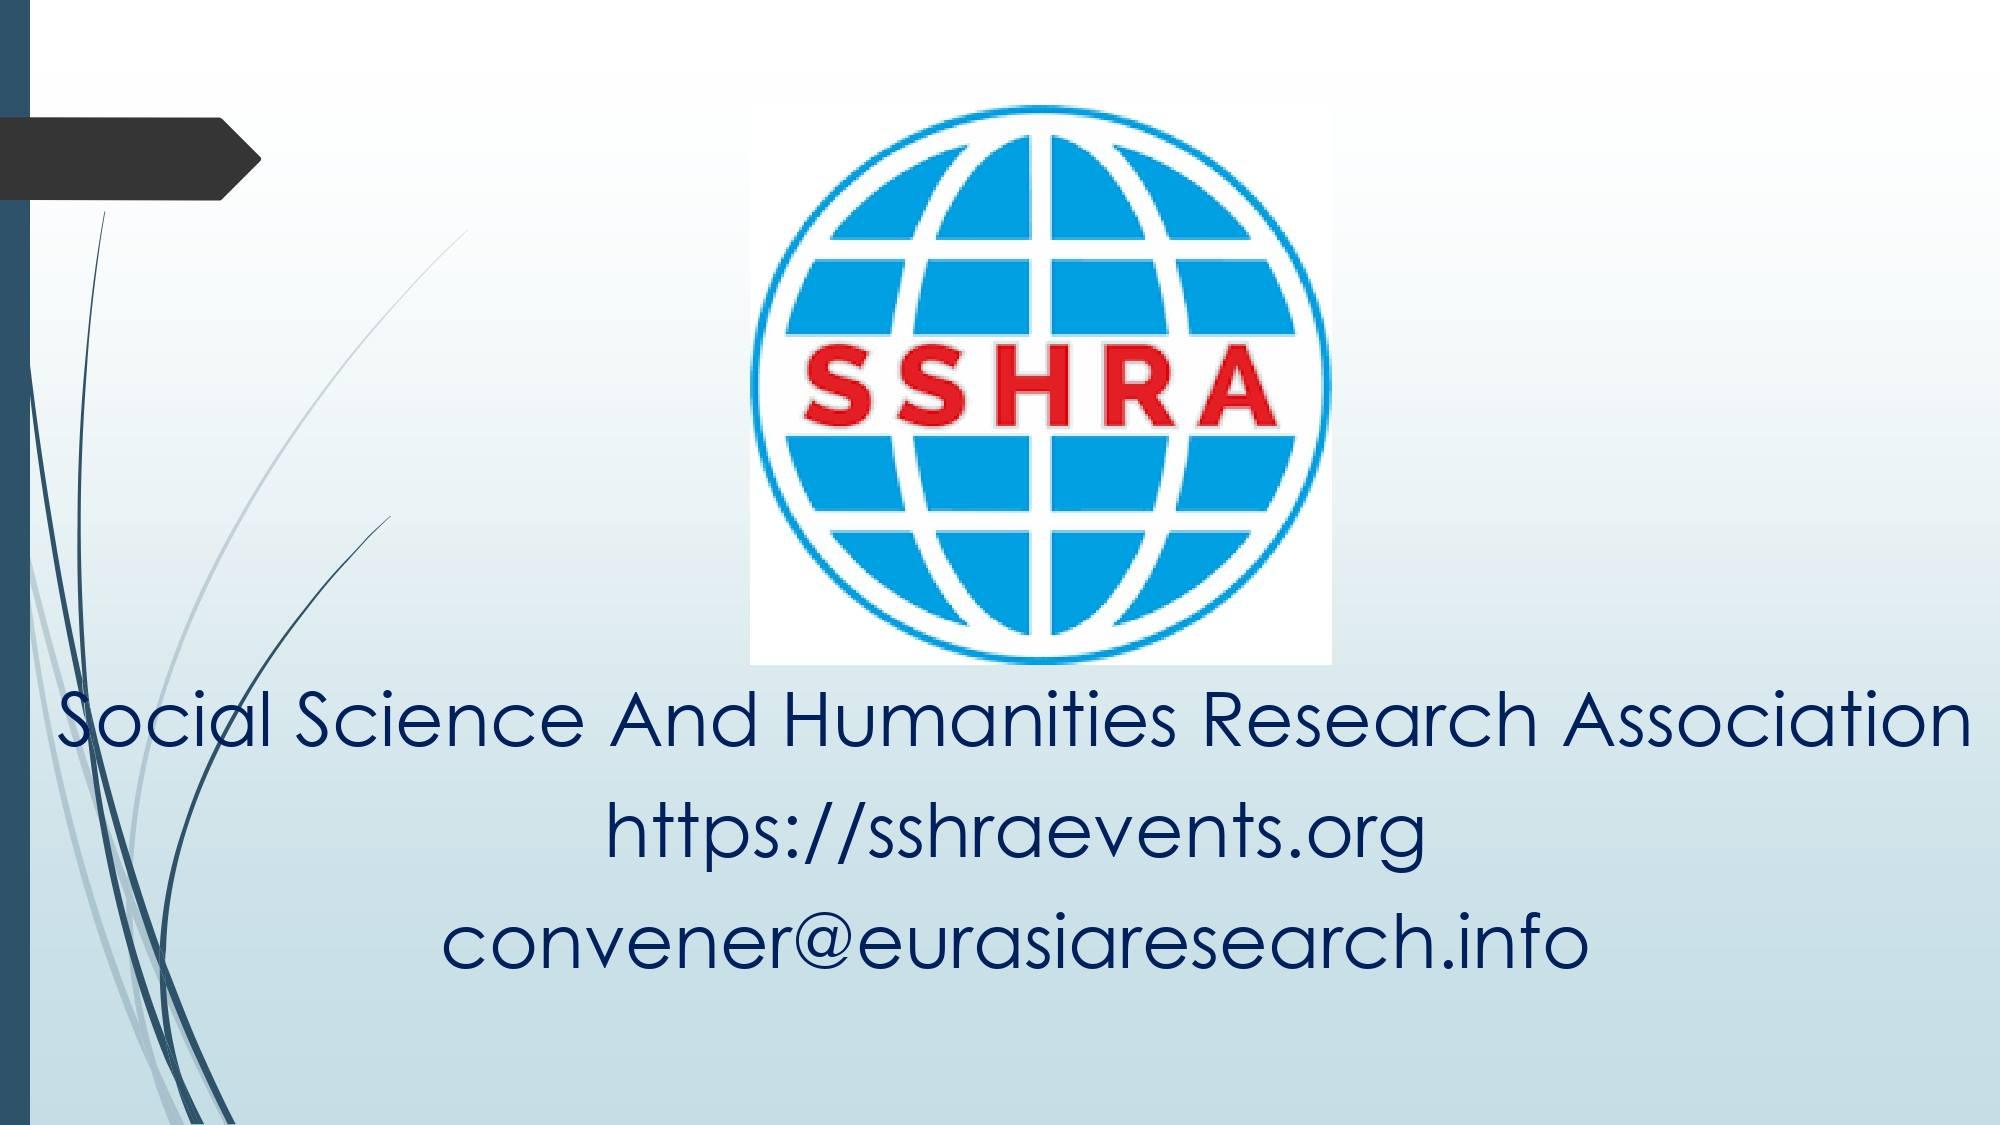 8th Dubai – International Conference on Social Science & Humanities (ICSSH), 24-25 October 2021, Dubai, United Arab Emirates